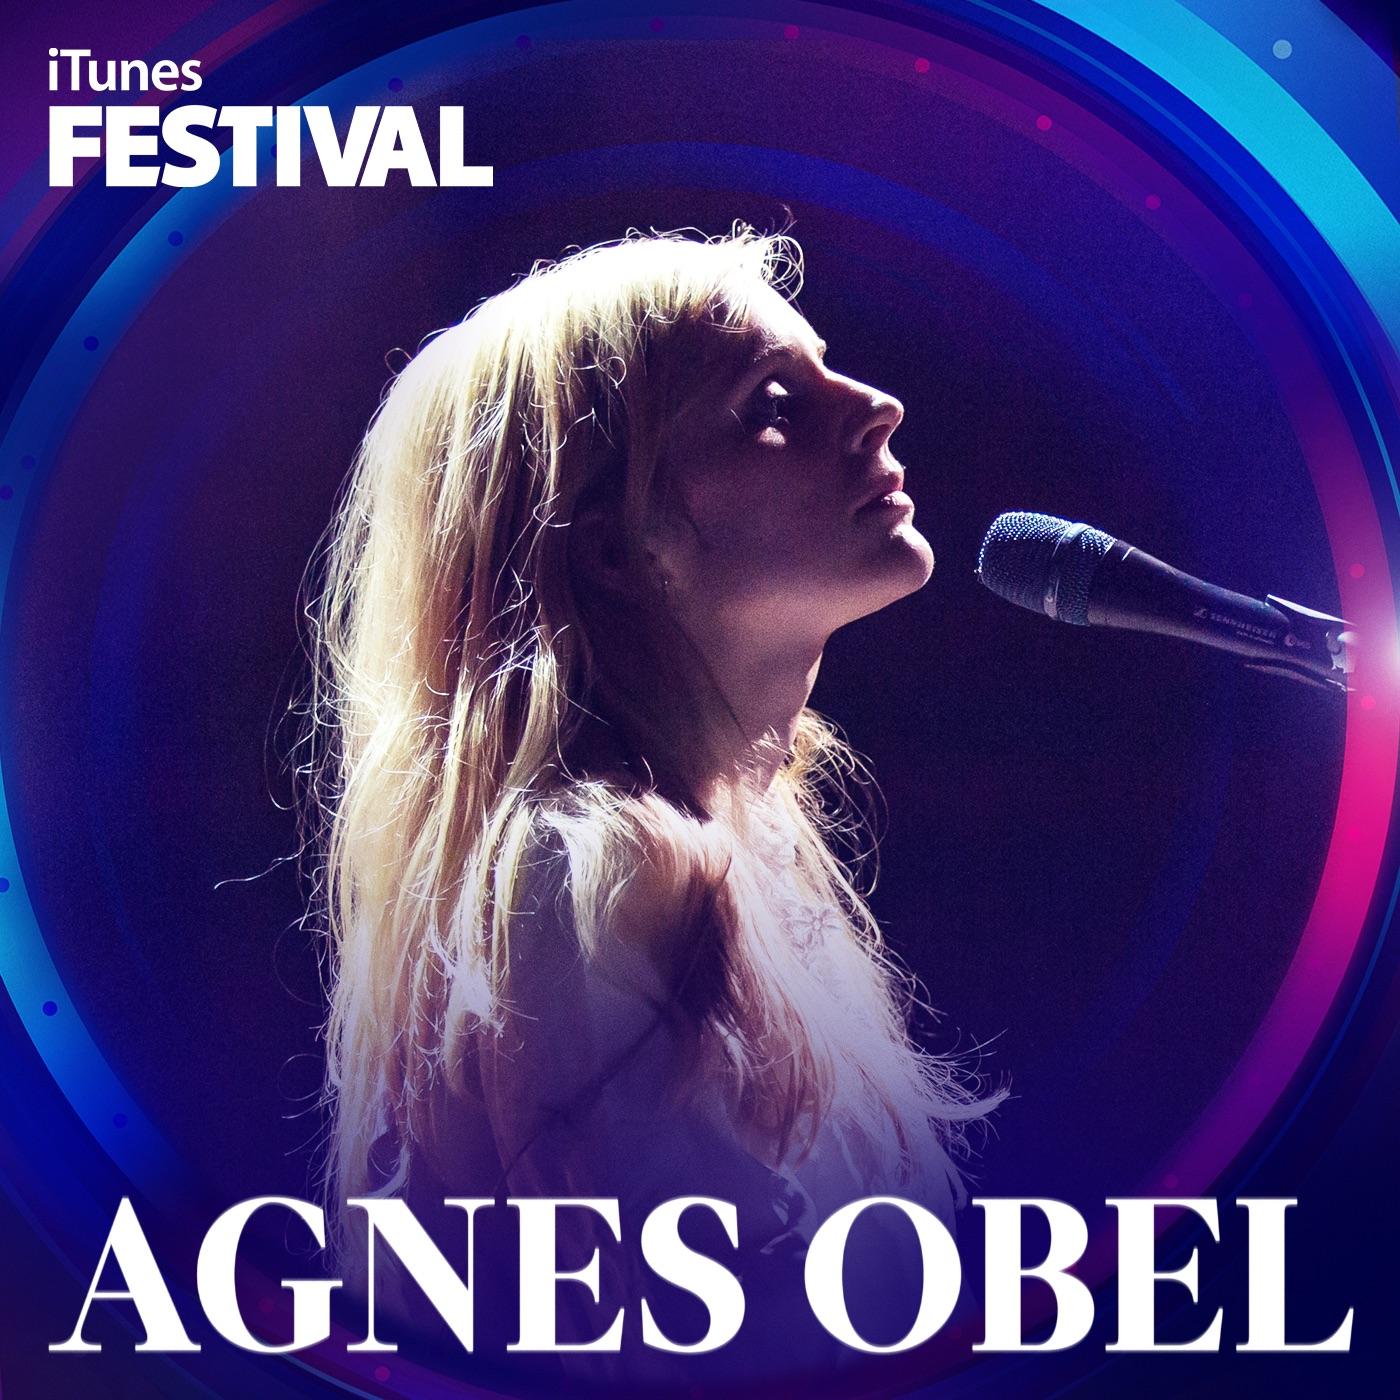 agnes obel album iTunes Festival: London 2013 - EP